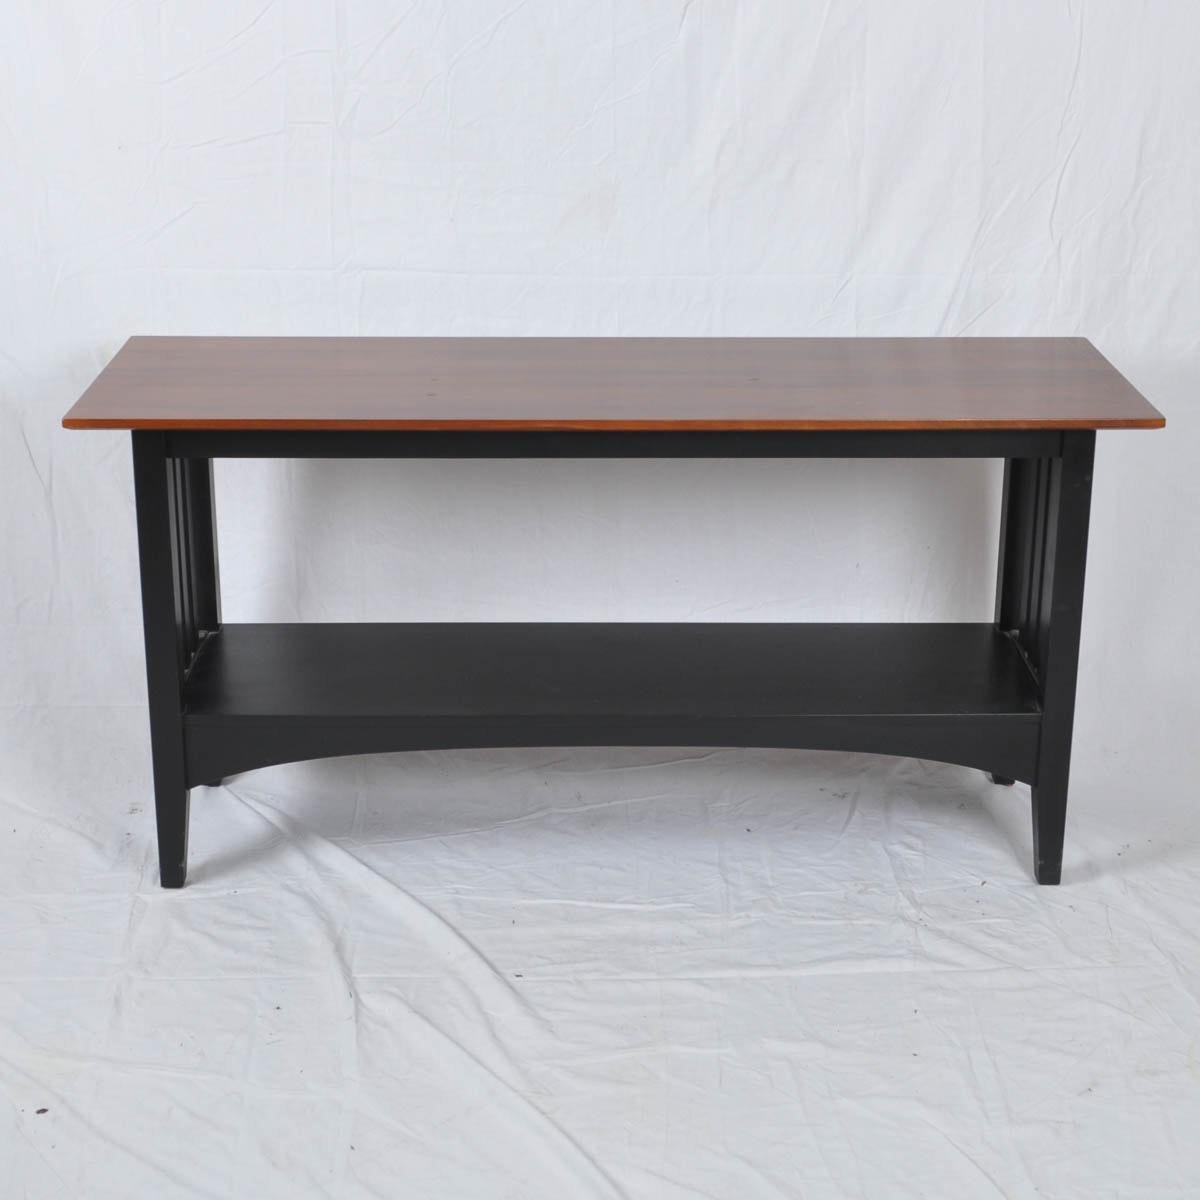 ethan allen american impressions sofa table : ebth